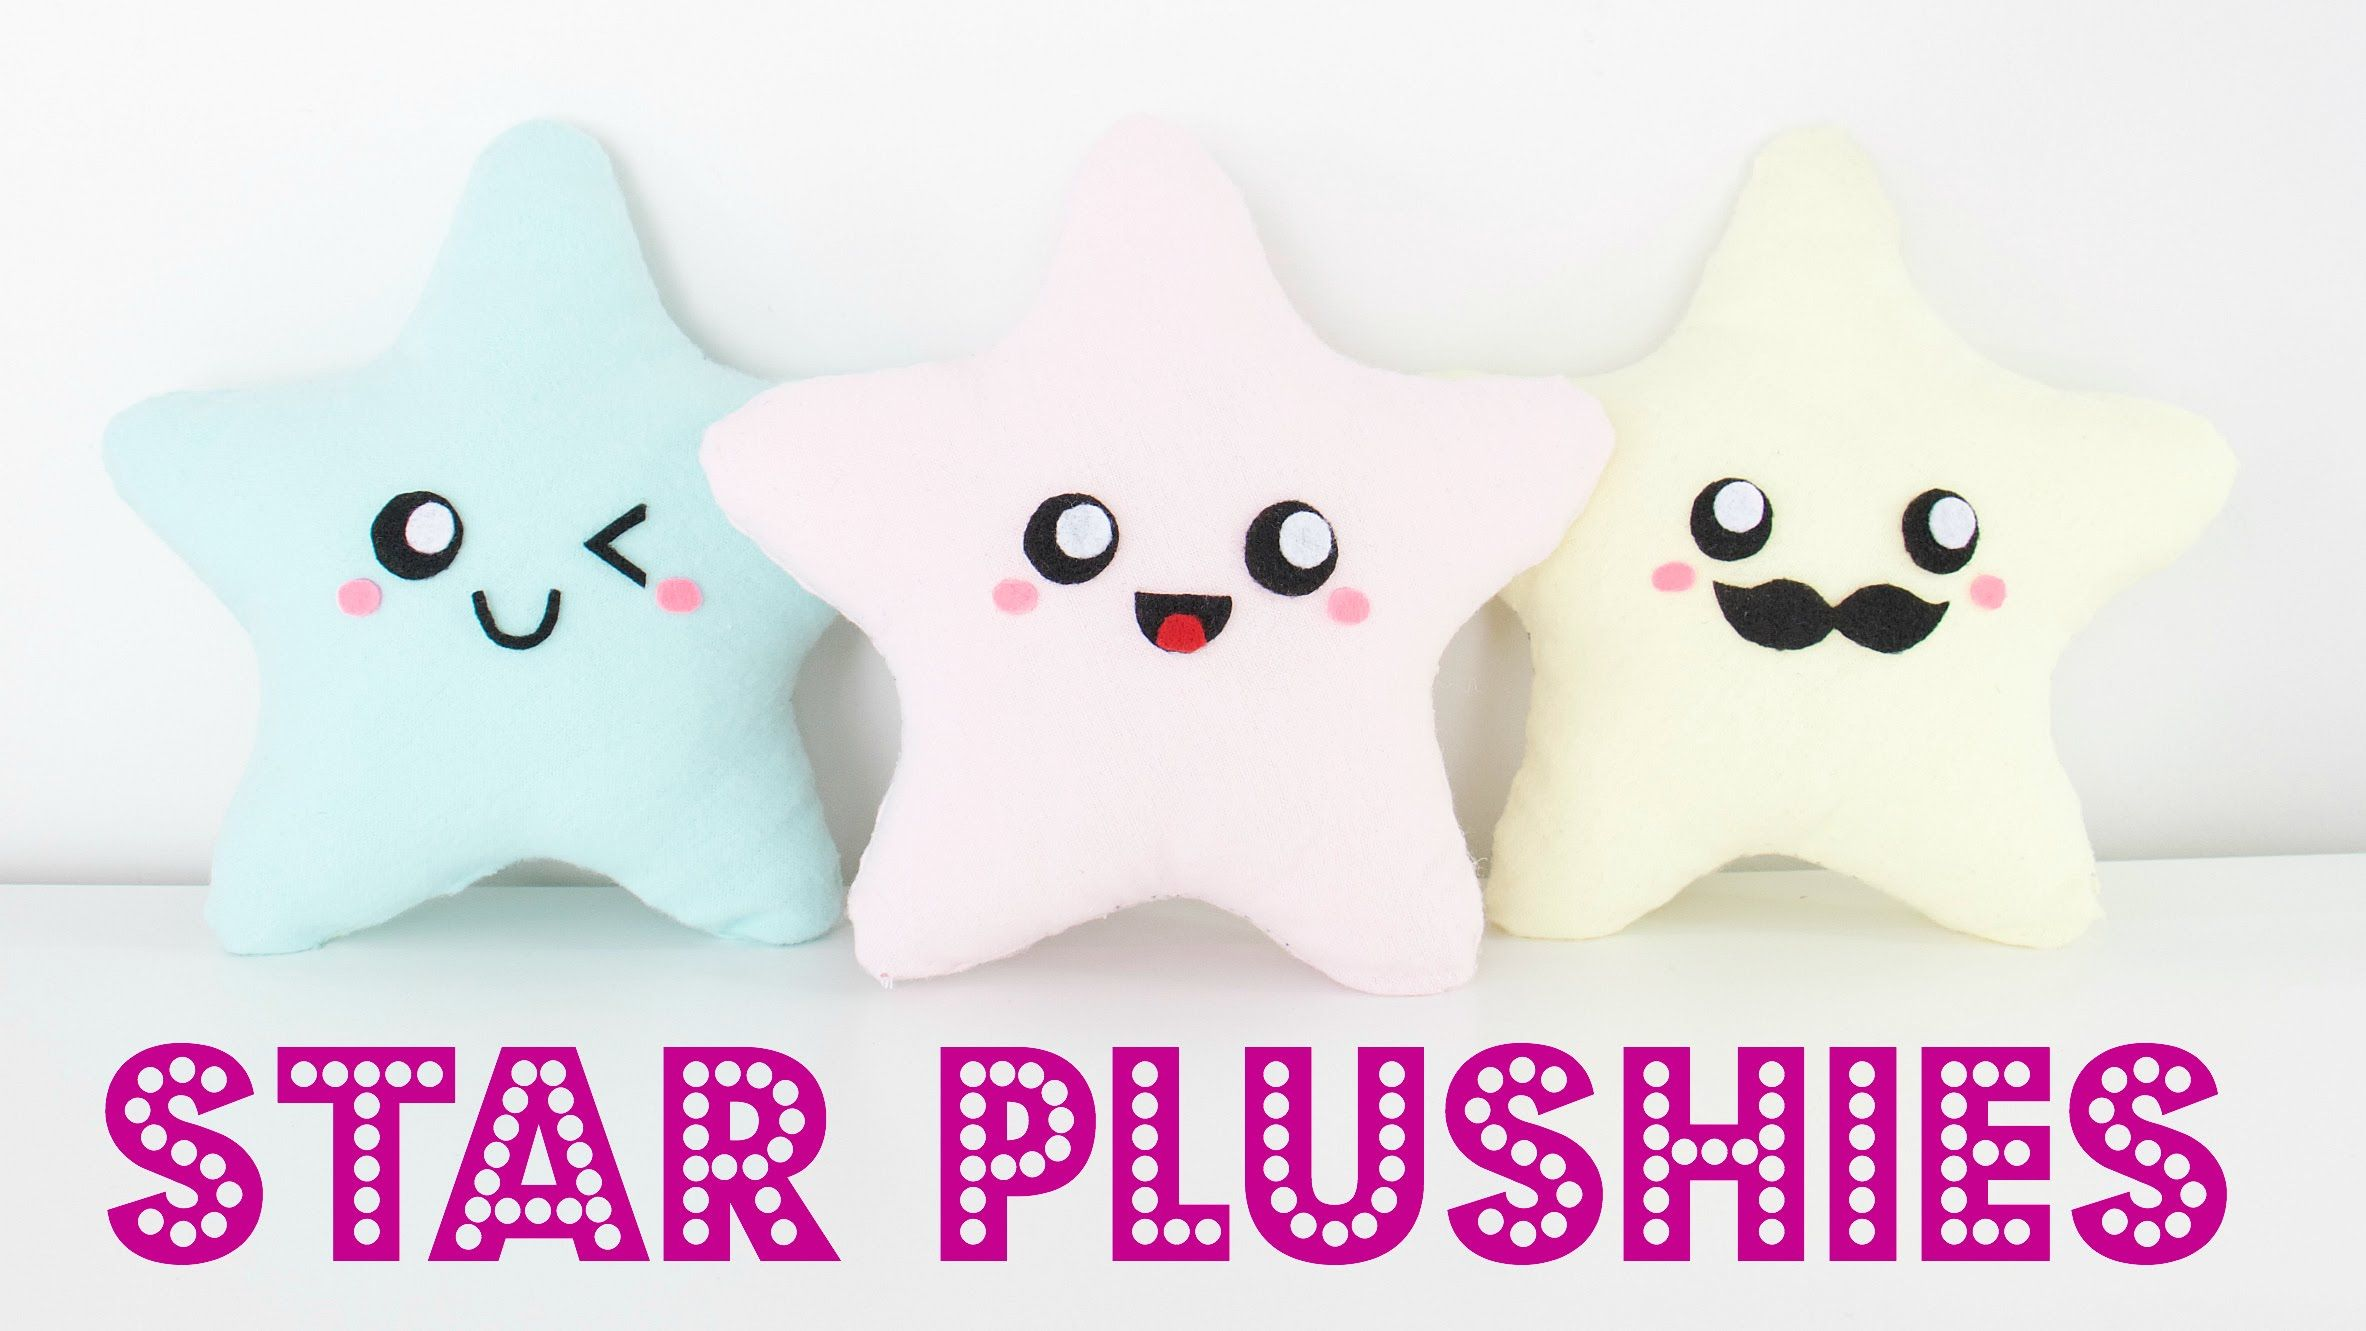 DIY Easy Kawaii Star Plush Pillows - Easy Room Decor & Gift Idea ...